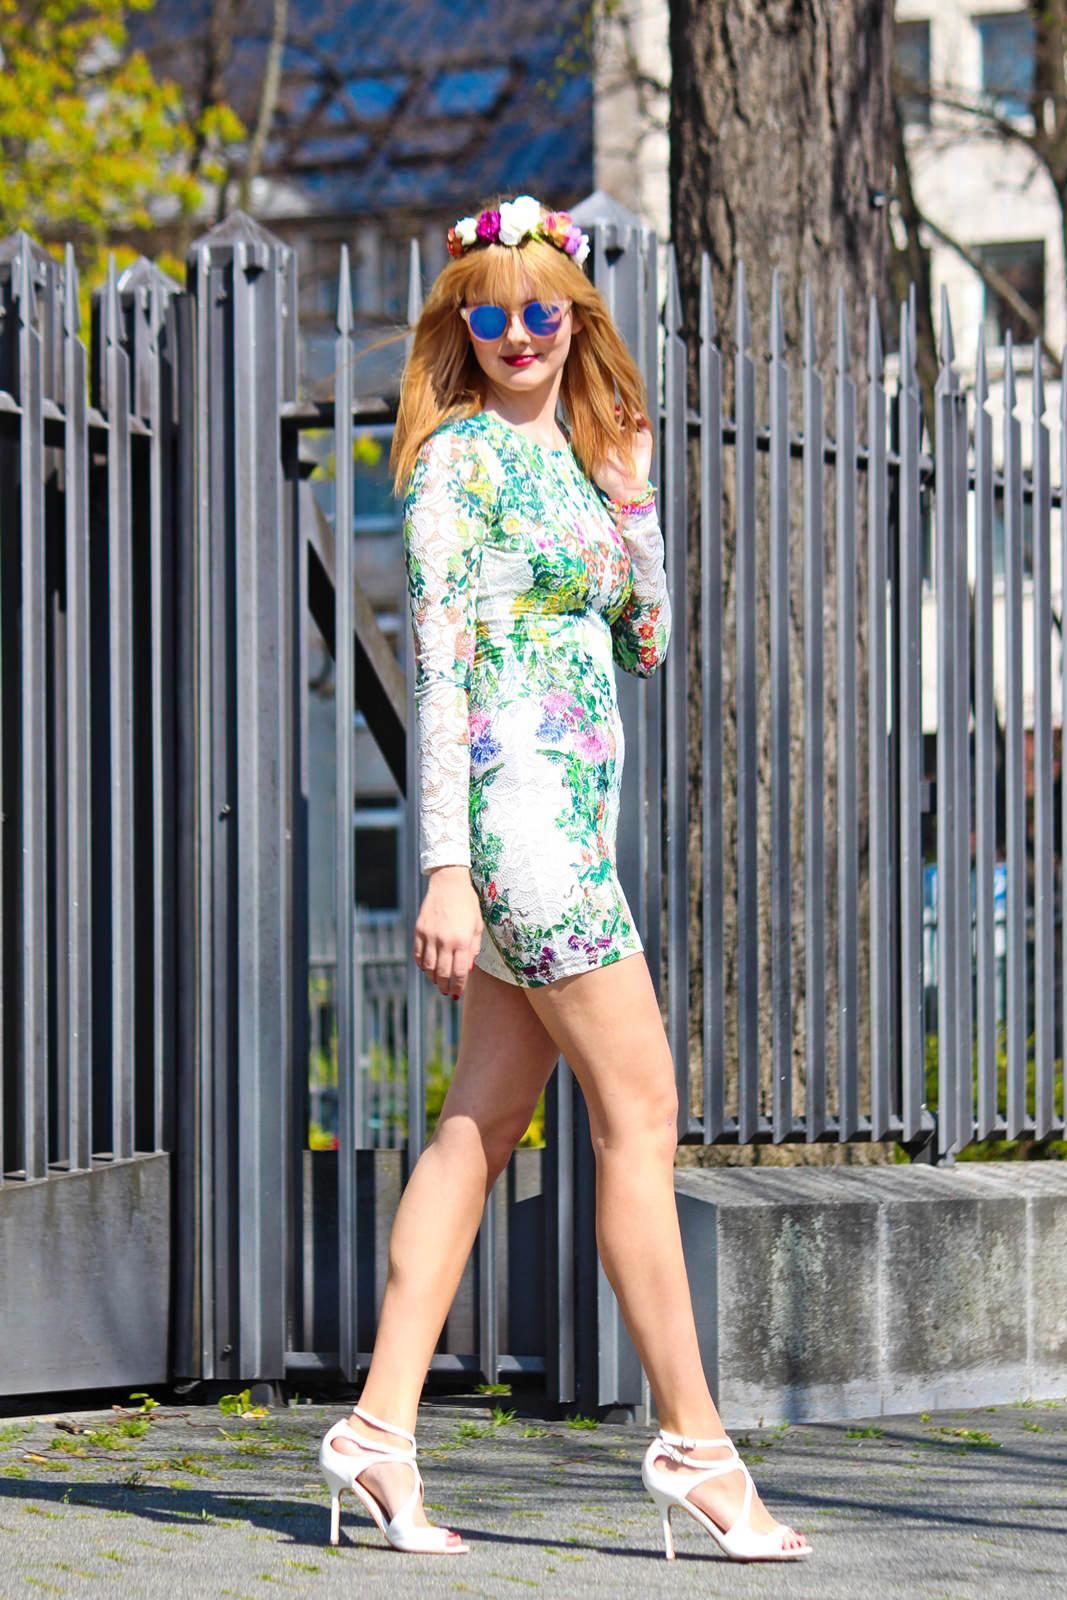 Des Belles Choses_Fashionblog Cologne_Forever 21 Flower Dress 3